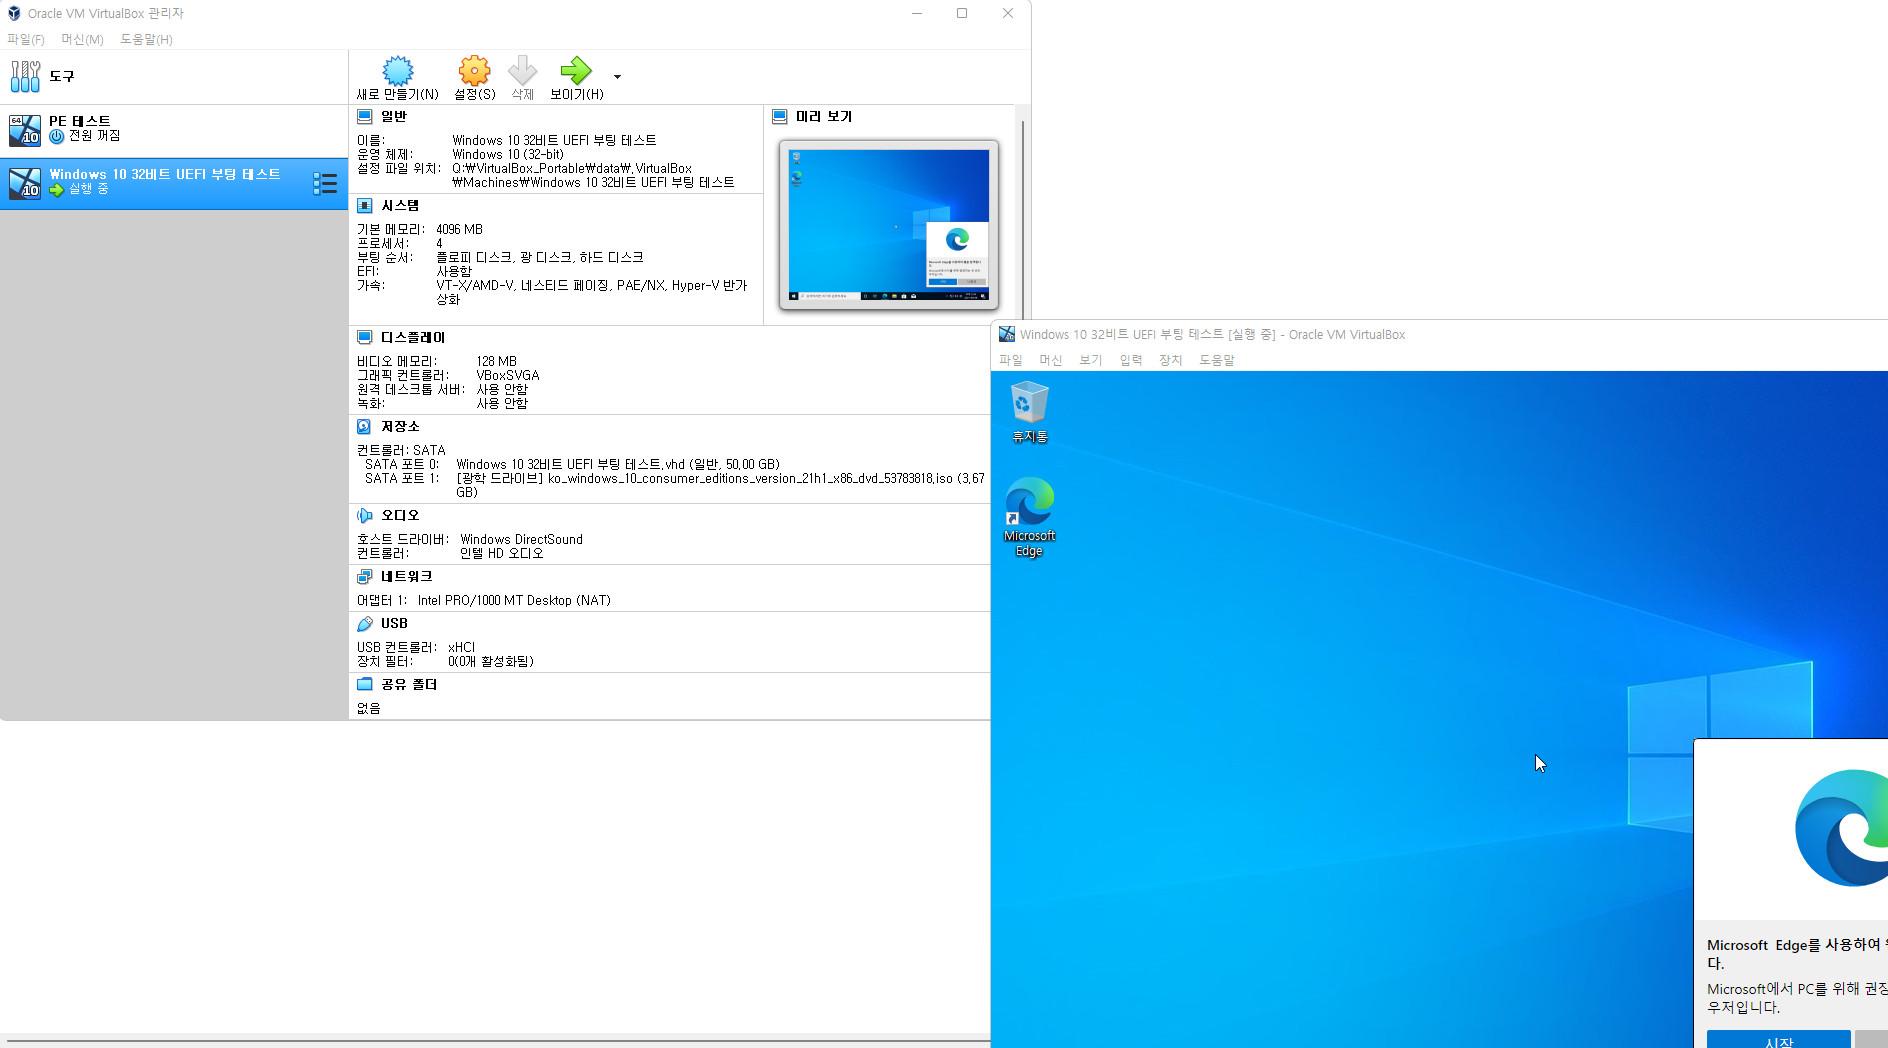 UEFI 부팅은 원래 32비트도 됩니다. 실컴은 메인보드 차원에서 32비트는 제한이 된 것 뿐입니다 - 가상머신에서는 32비트도 UEFI 됩니다 2021-09-08_144441.jpg